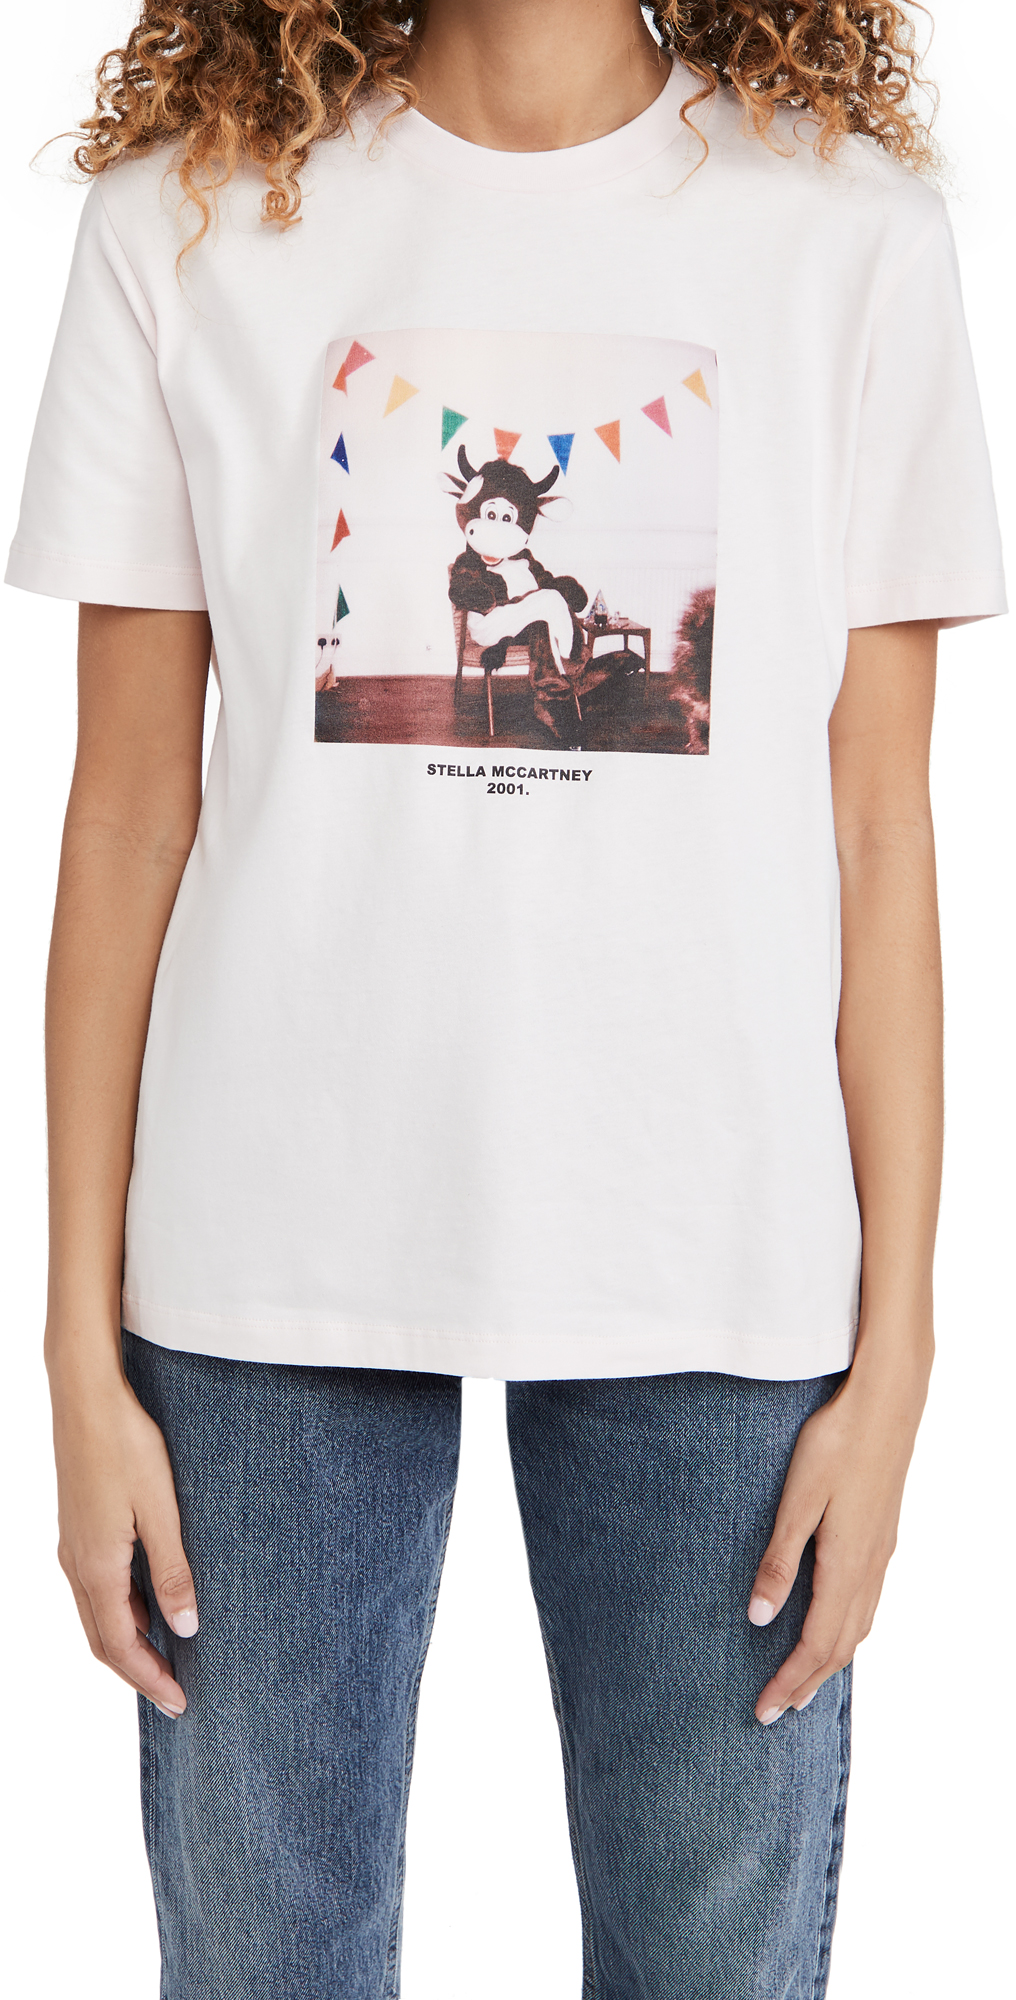 Stella McCartney Year Of The Ox T-Shirt